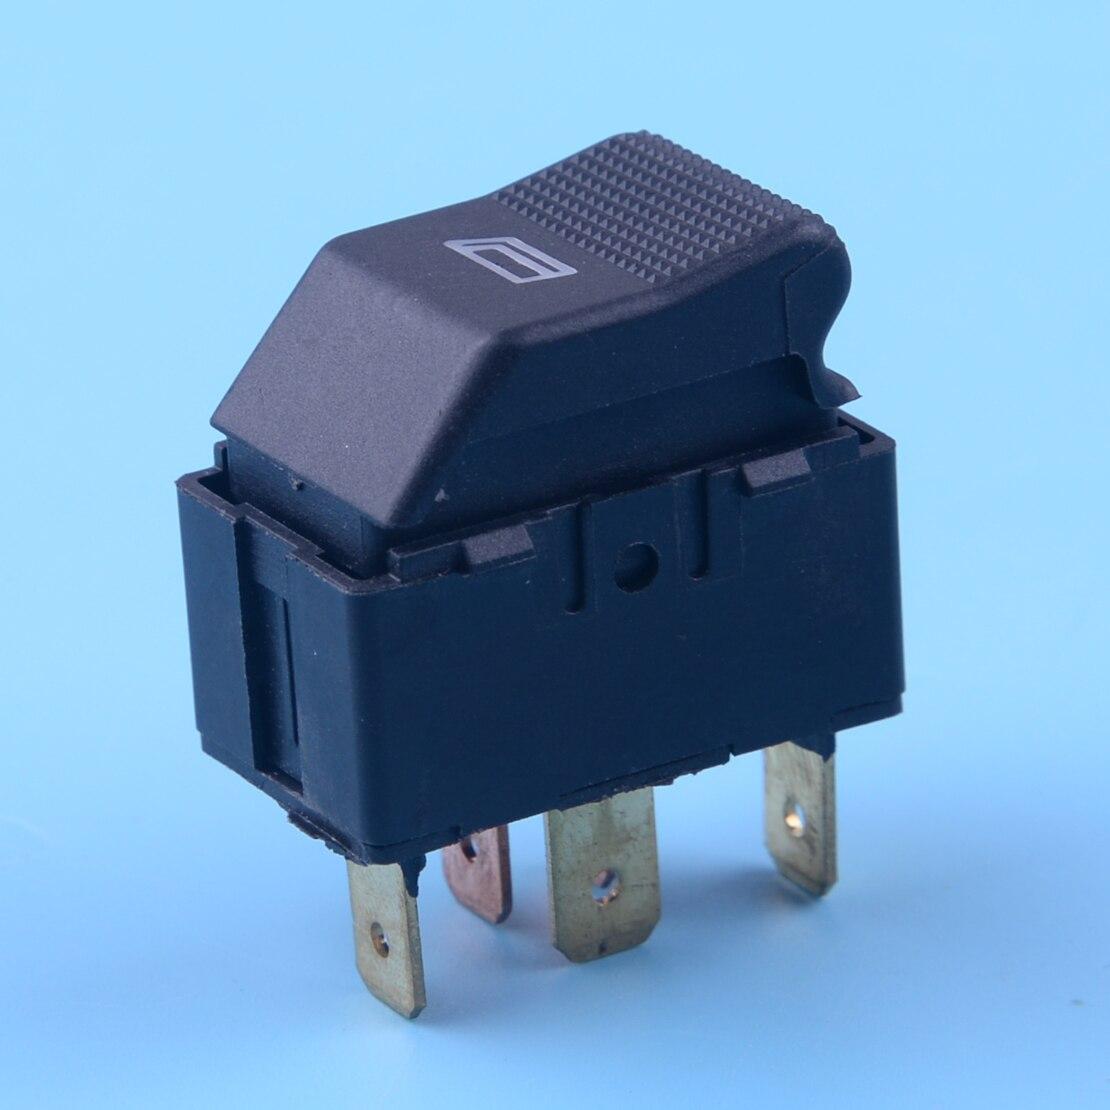 ELECTRIC POWER WINDOW SWITCH BUTTON FOR VOLKSWAGEN MULTIVAN T4 T5 2003